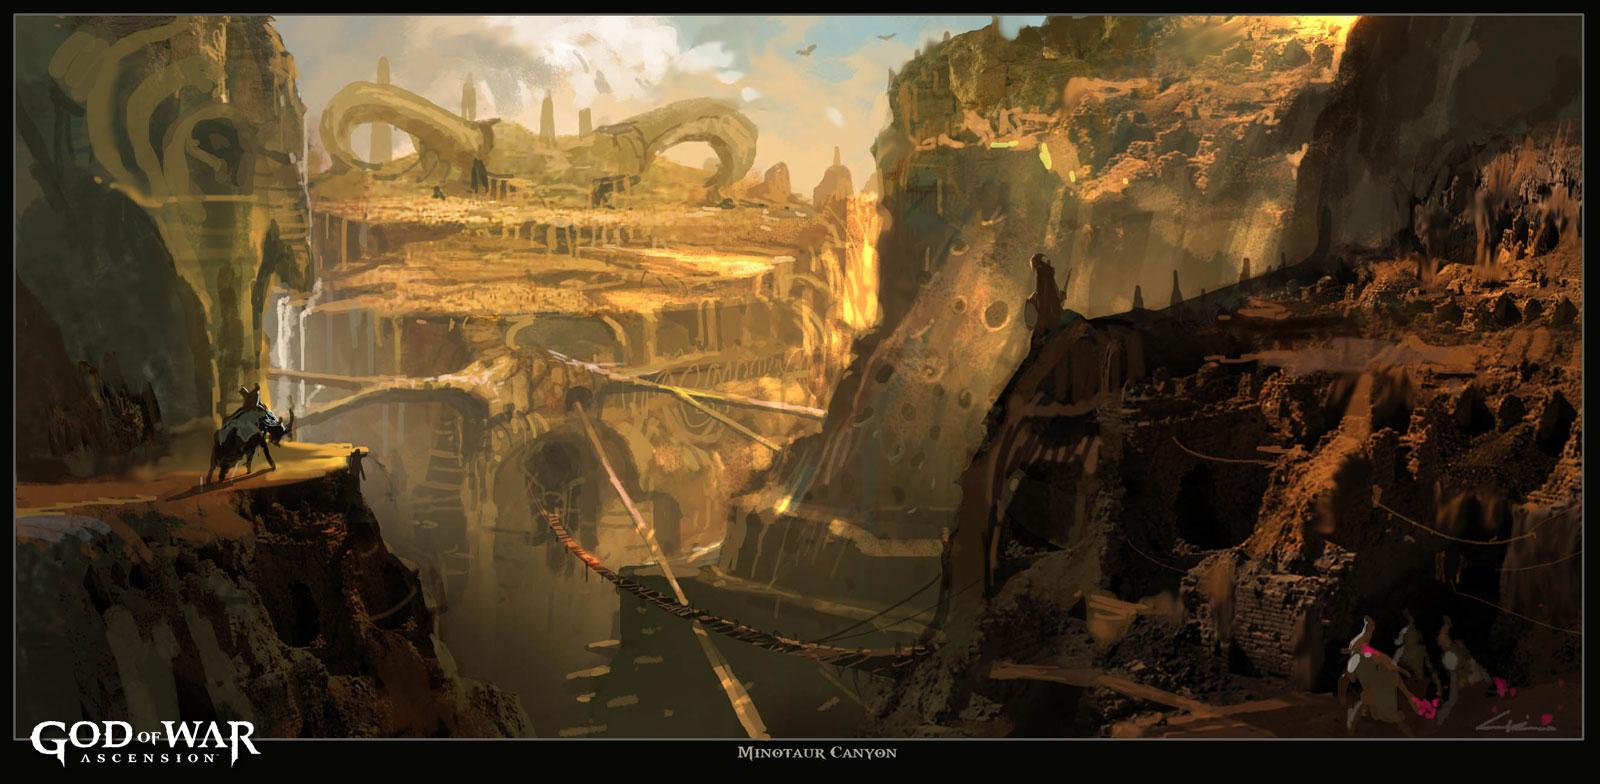 God of War Ascension artwork 02022013f minotaur canyon